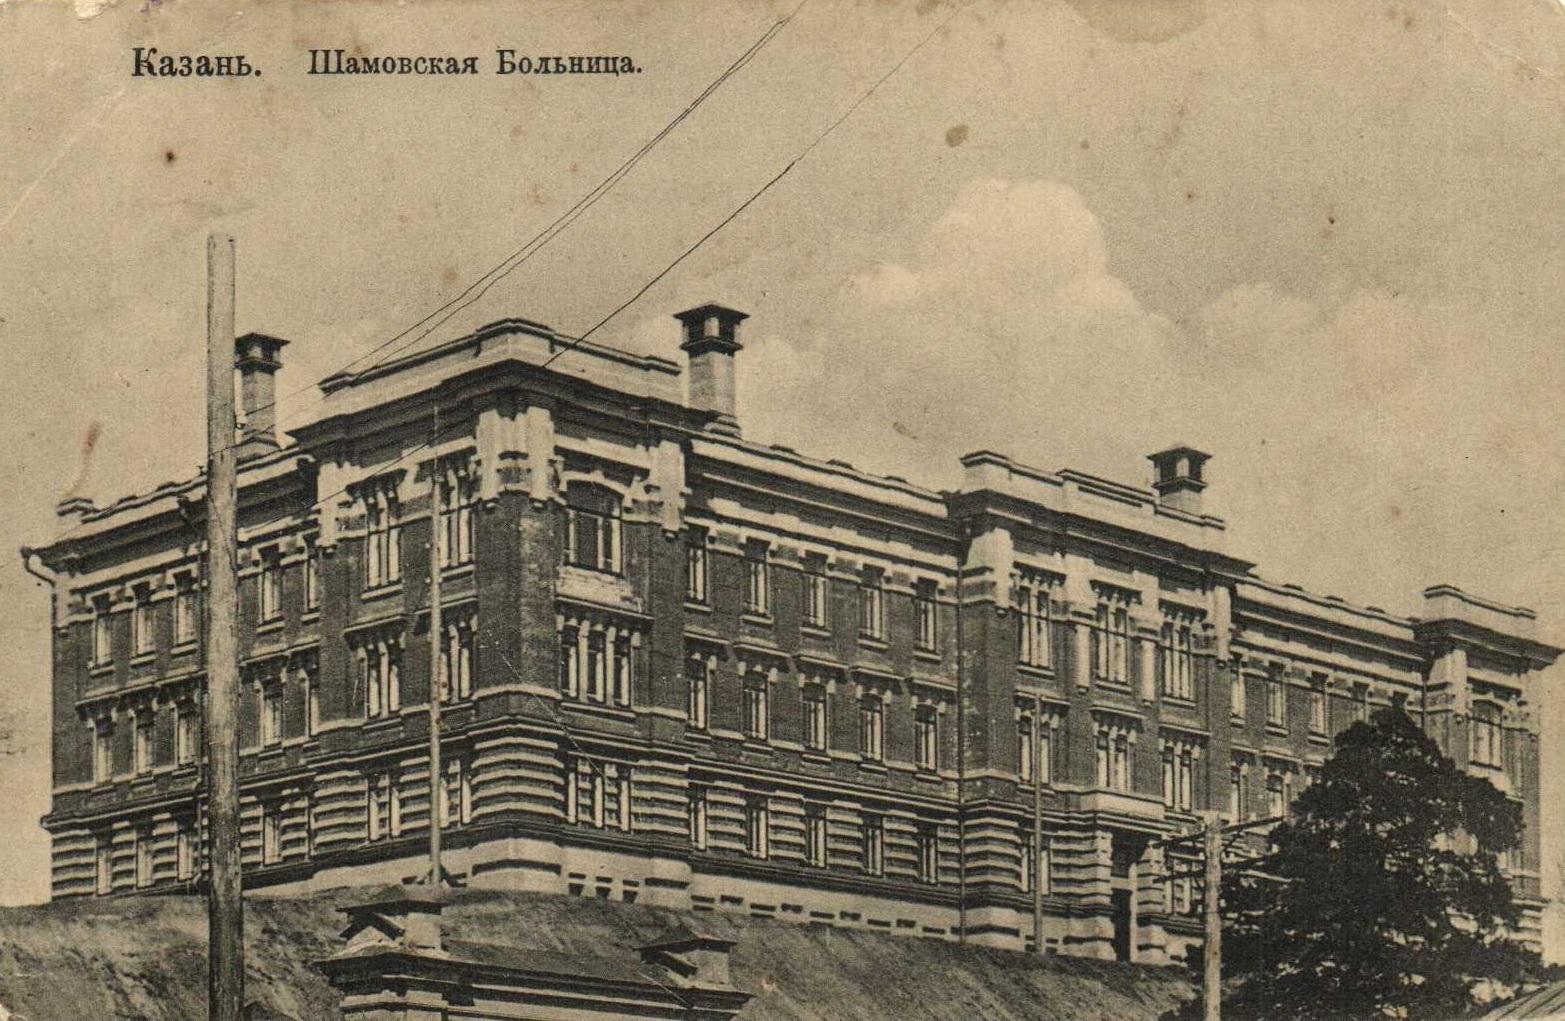 Фото: 1910-1917 годы. Фото: humus.livejournal.com